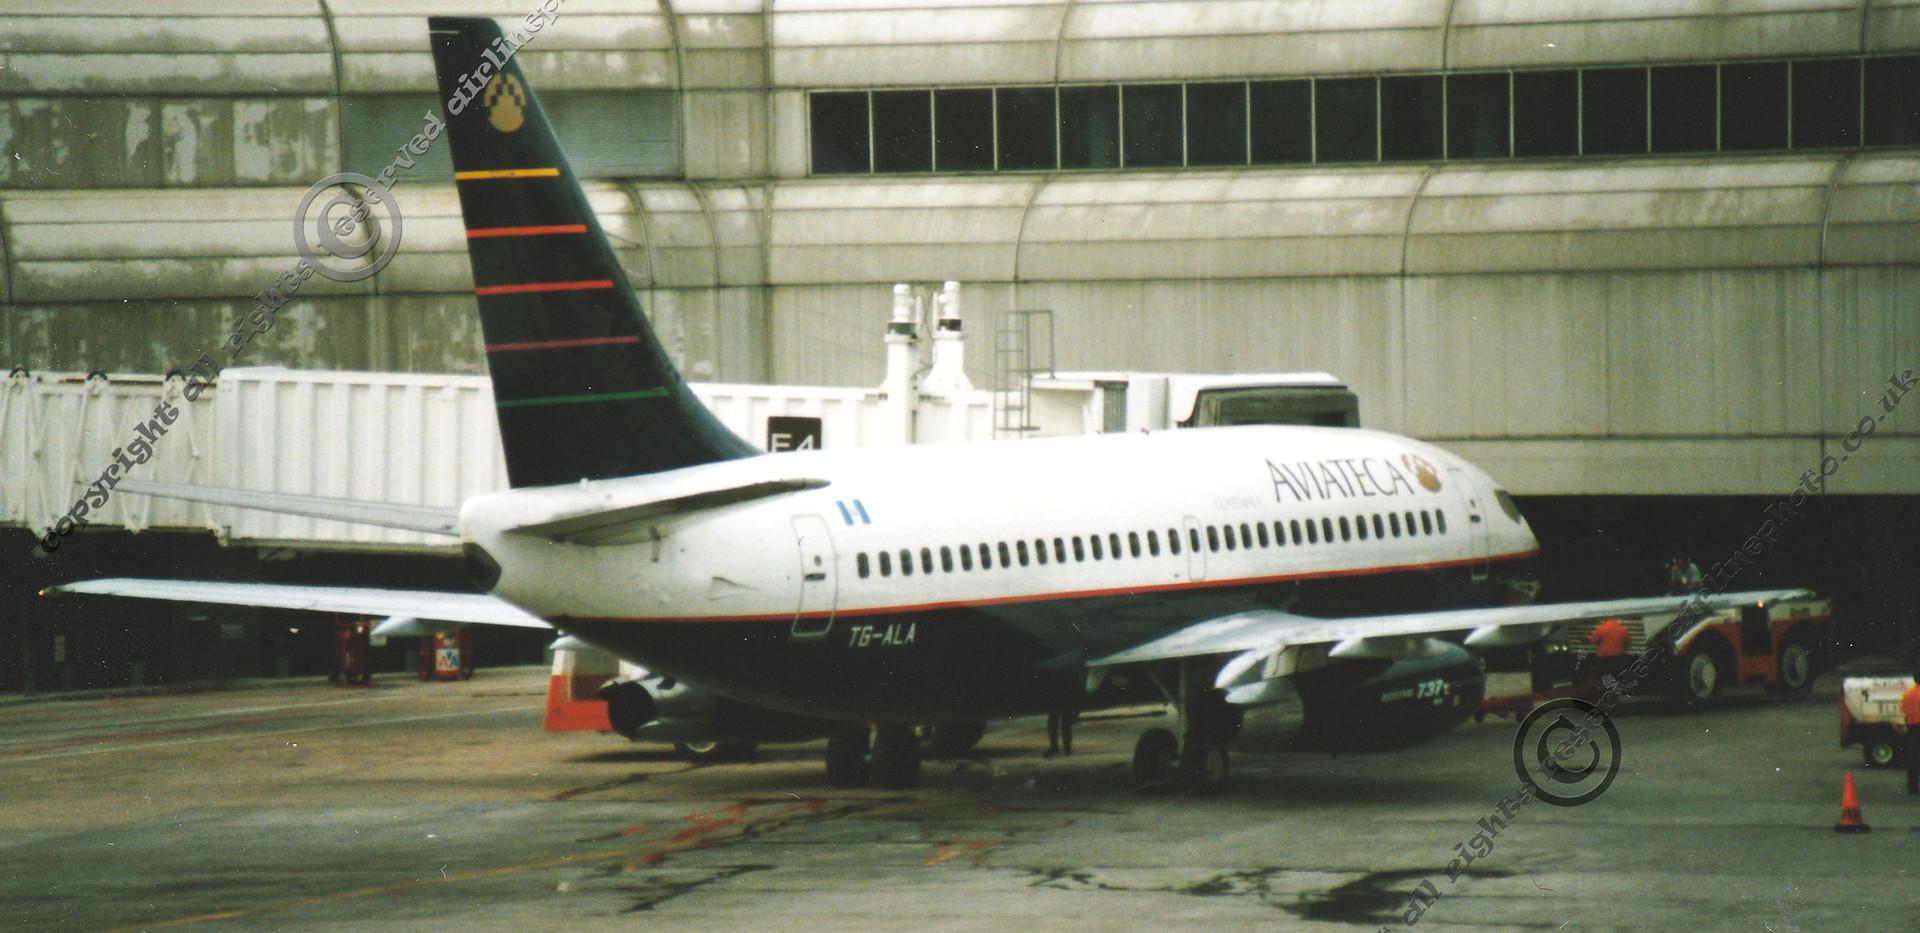 TG-ALA-Aviateca-737-MIA-1992.jpg